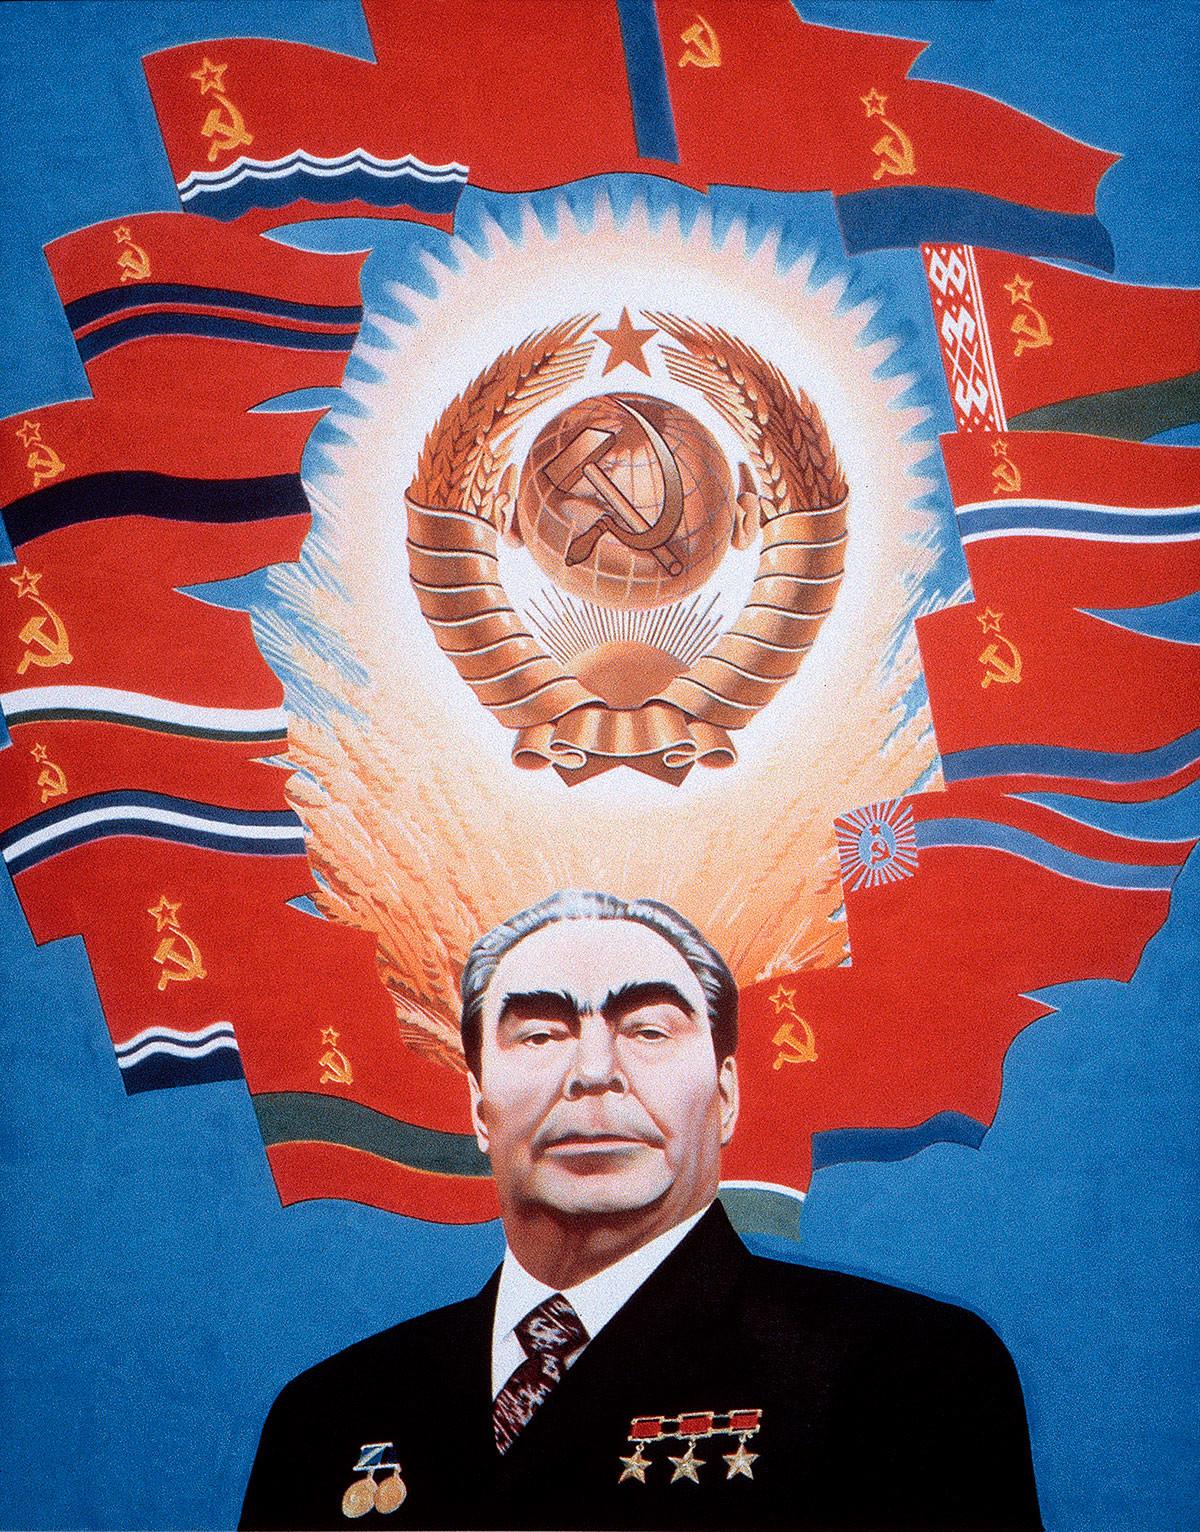 Eric Bulatov. Brezhnev. Ruang Angkasa Soviet, 1977.